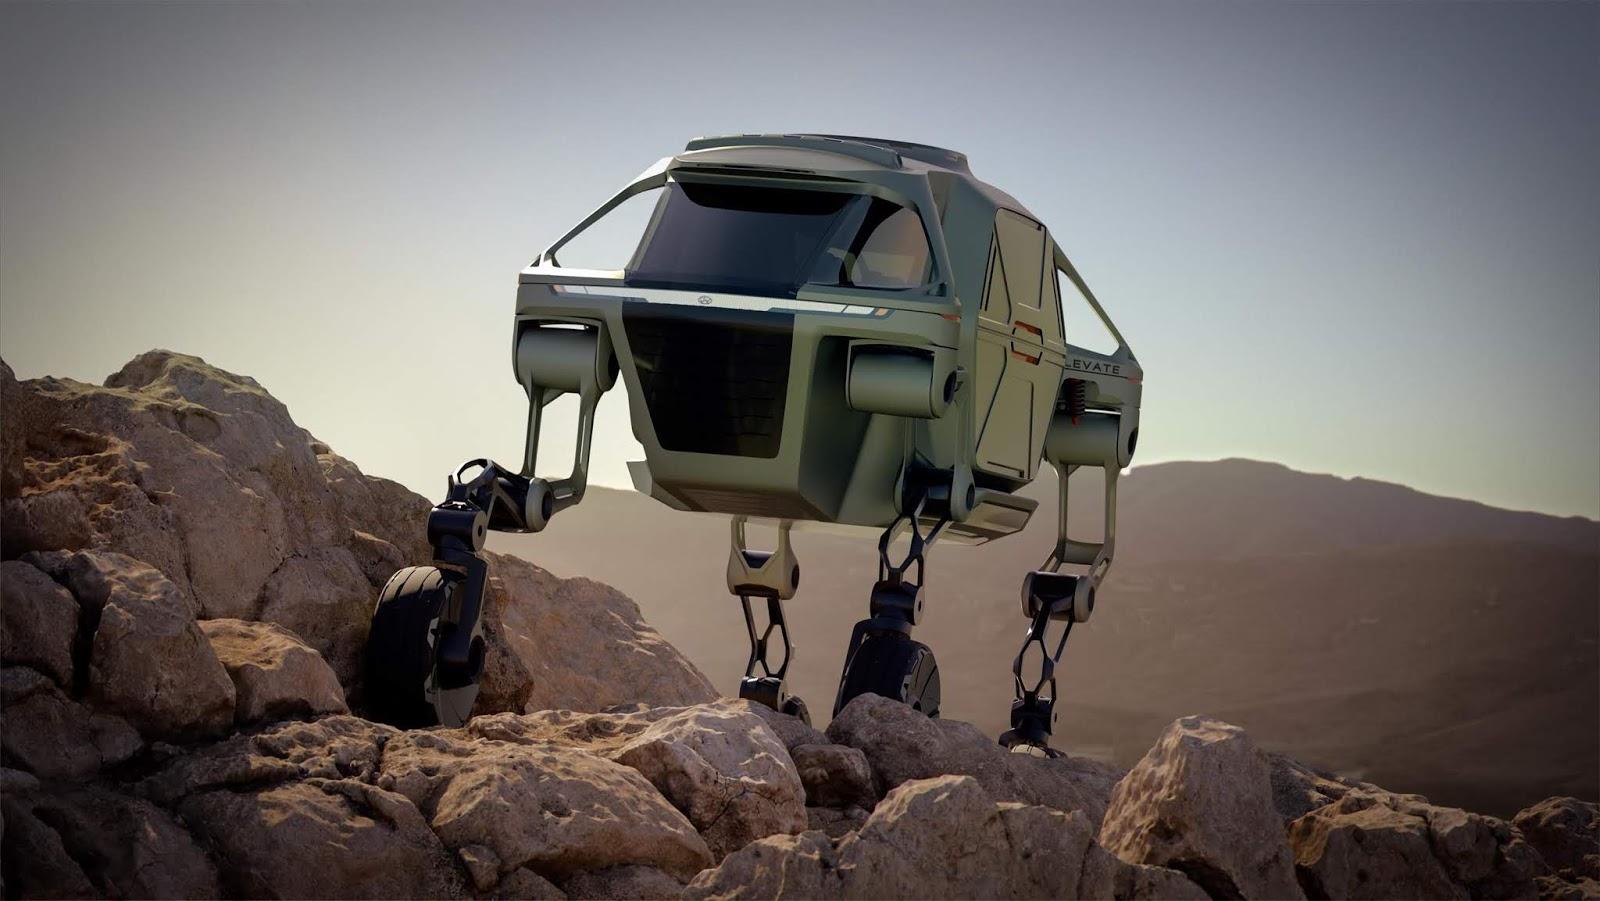 hyundai elevate concept252822529 H Hyundai έβγαλε όχημα με ρομποτικά πόδια! Electric cars, Hyundai, zblog, Τεχνολογία